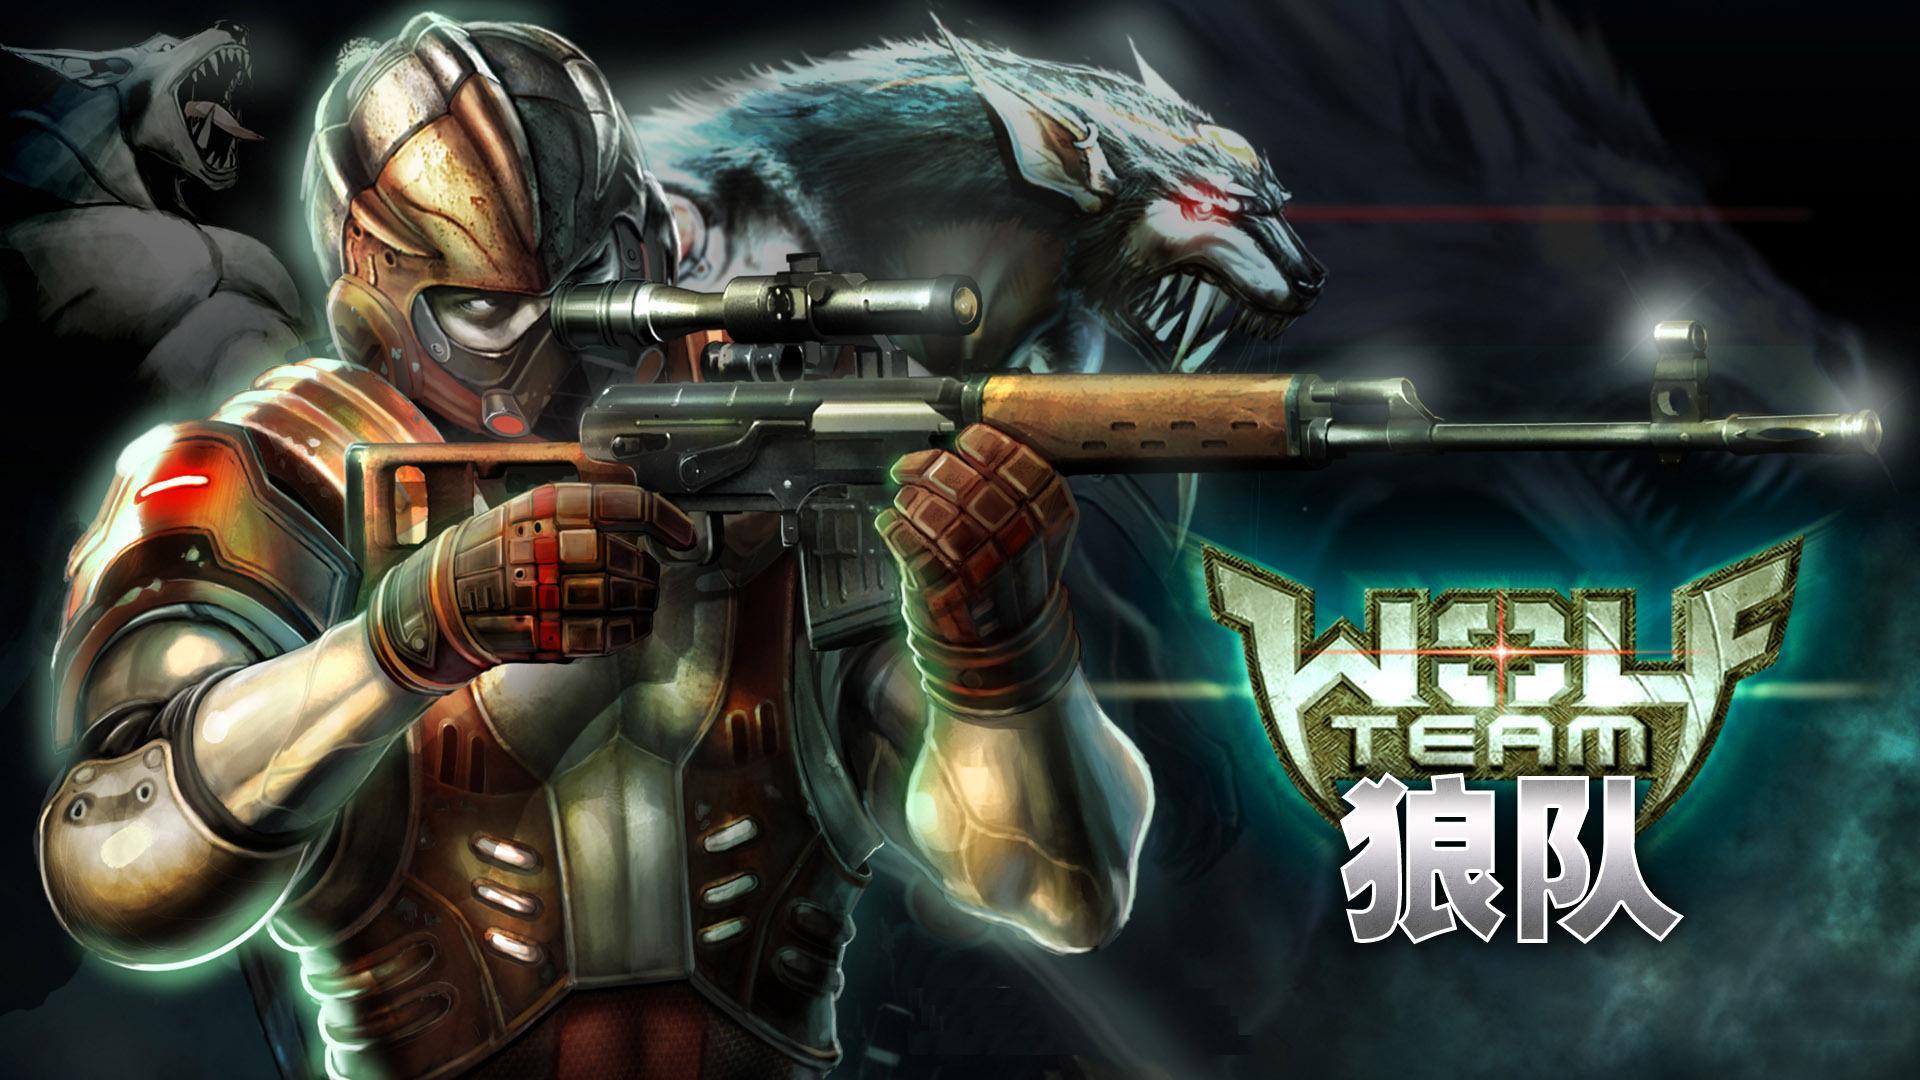 HD Wolf Team sniper Wallpaper  Download Free  148569